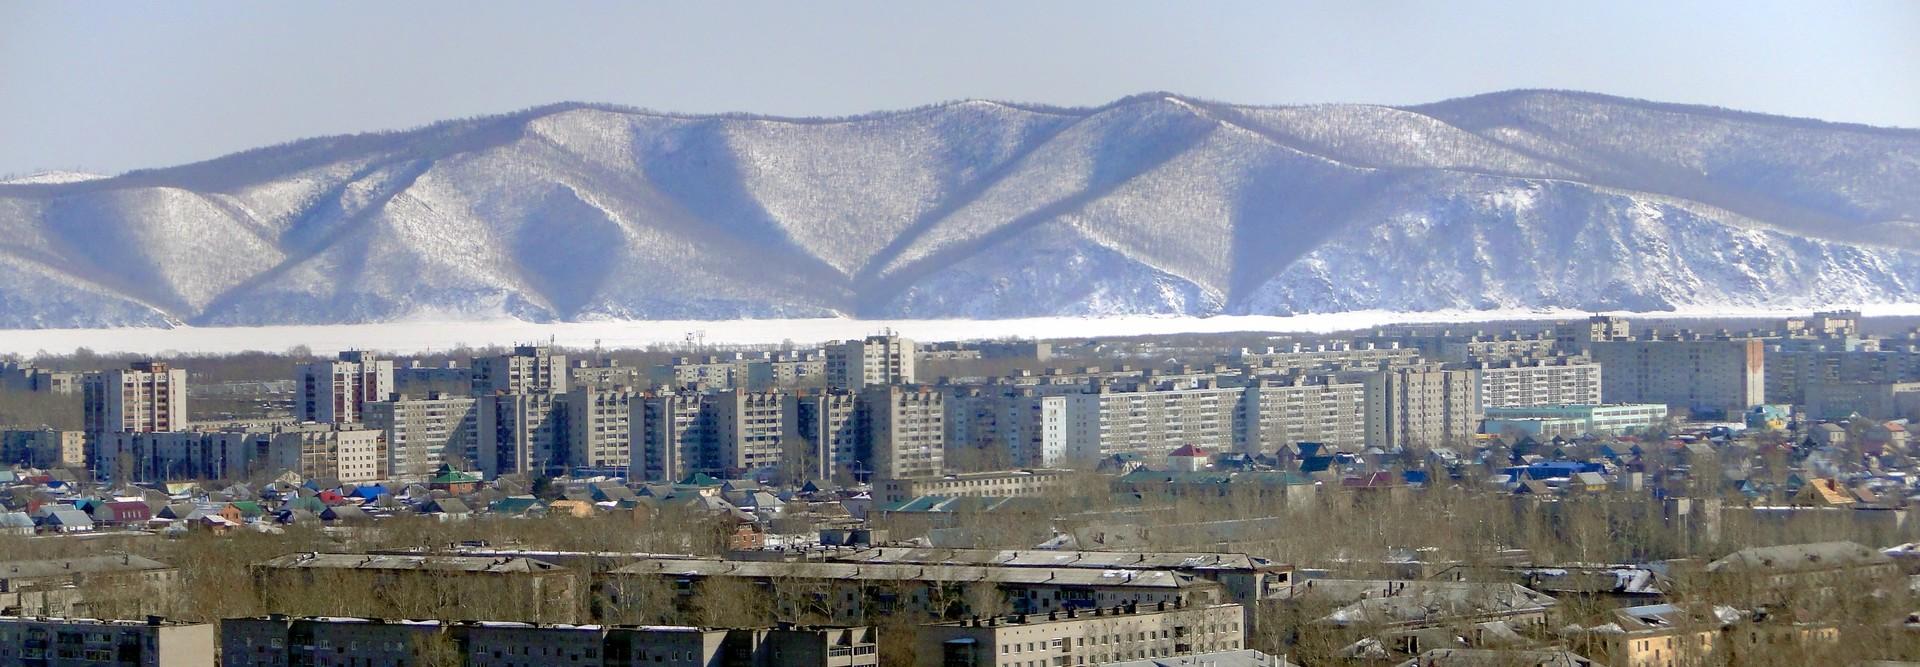 Leninsko okrožje